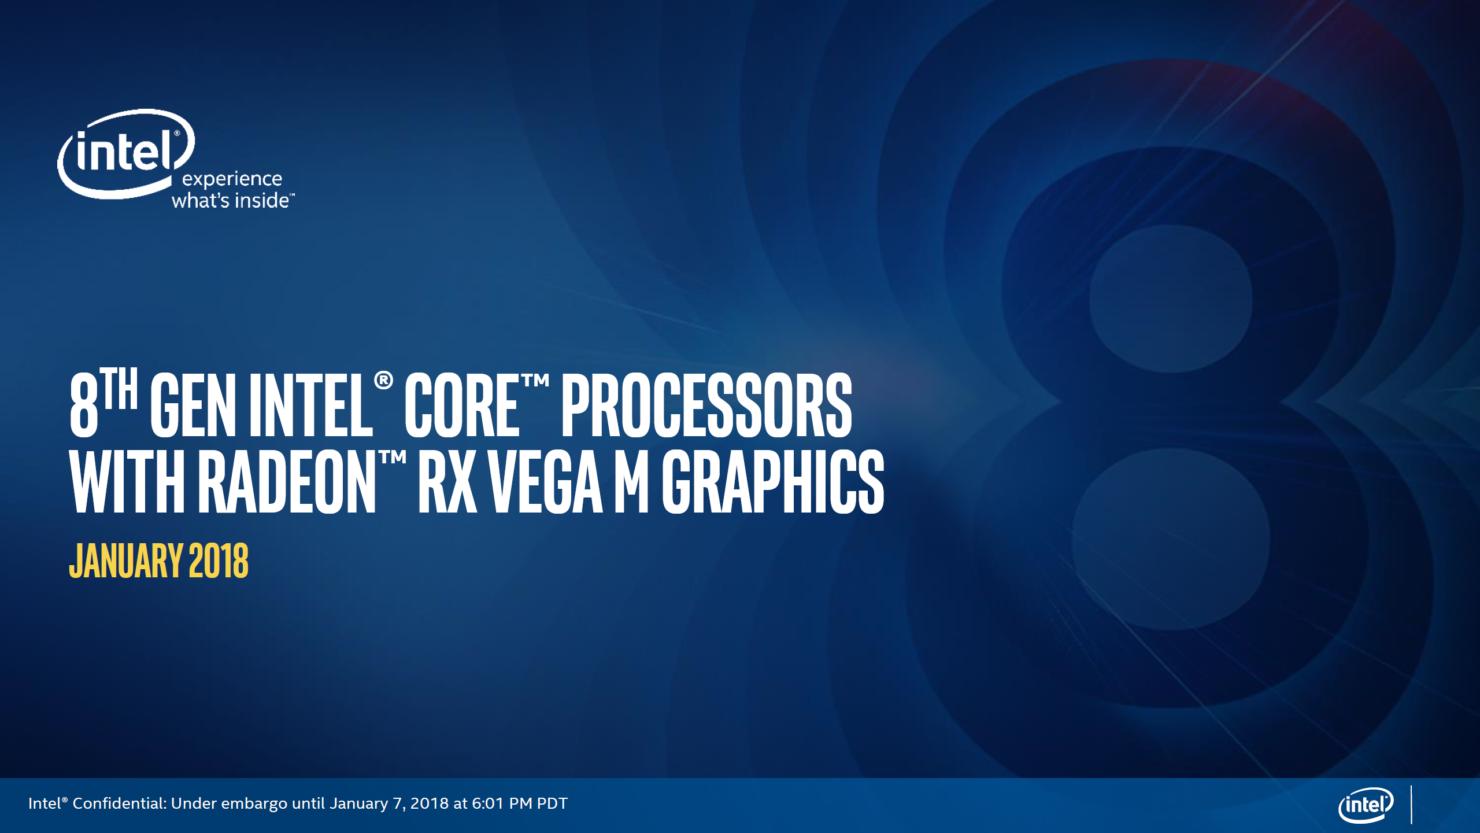 intel-8th-generation-core-processors-with-amd-radeon-rx-vega-m-graphics_1